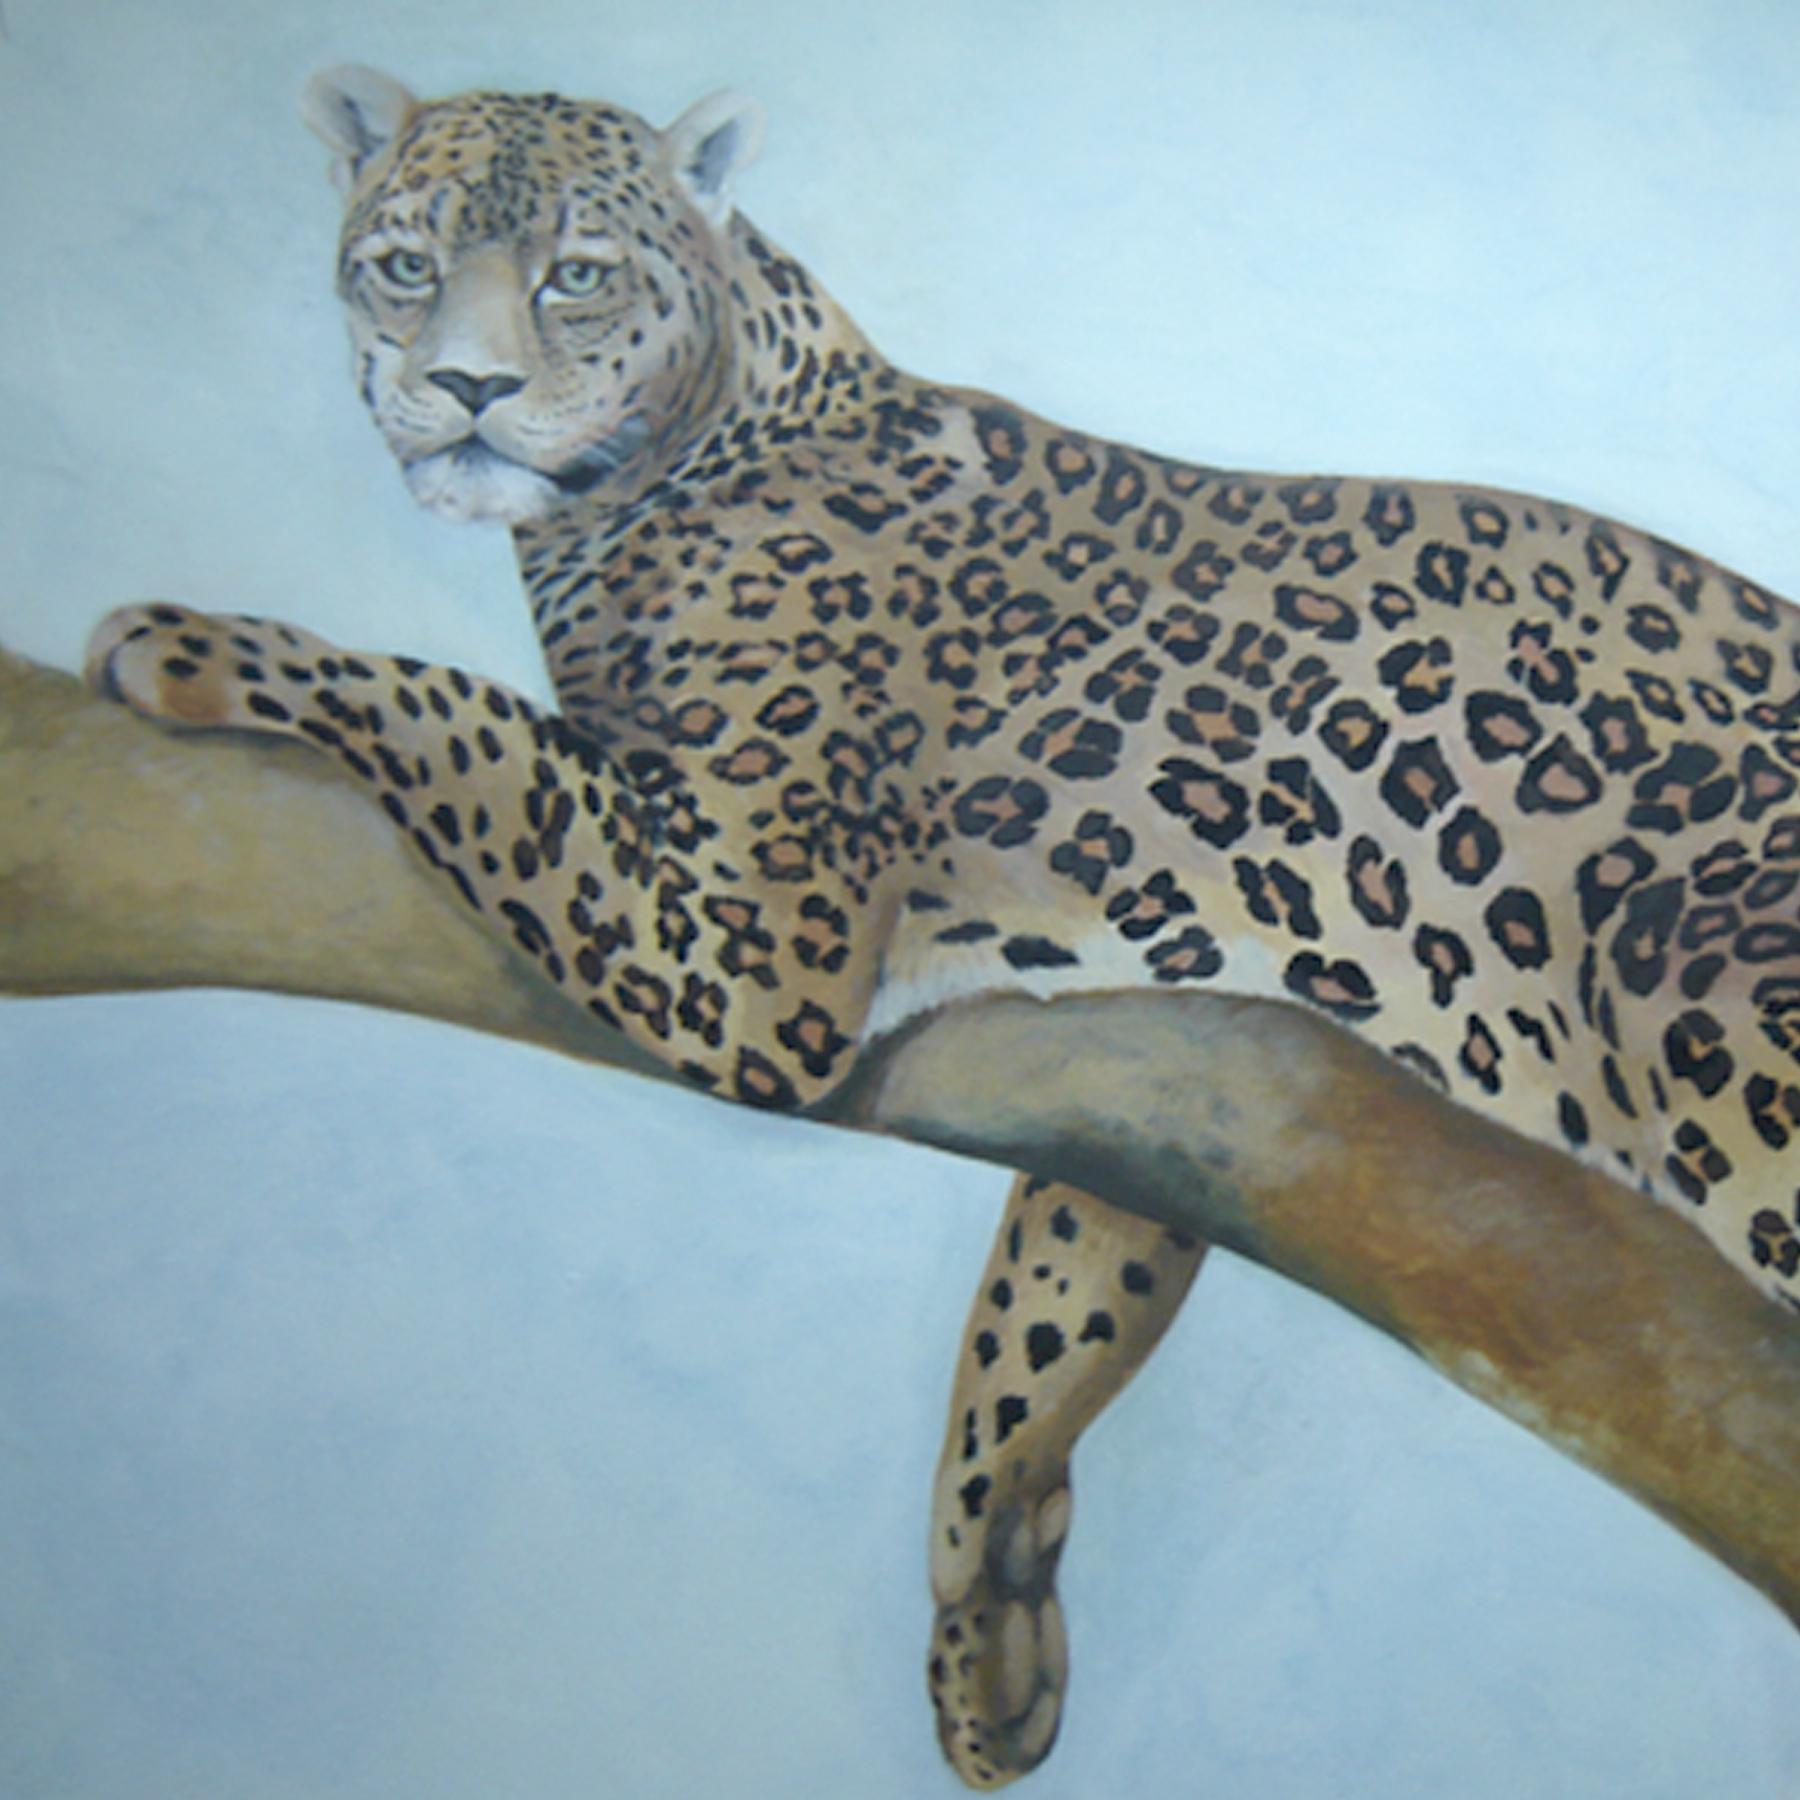 Pintura decorativa leopardo mural tienda caza armeria animales madrid toledo